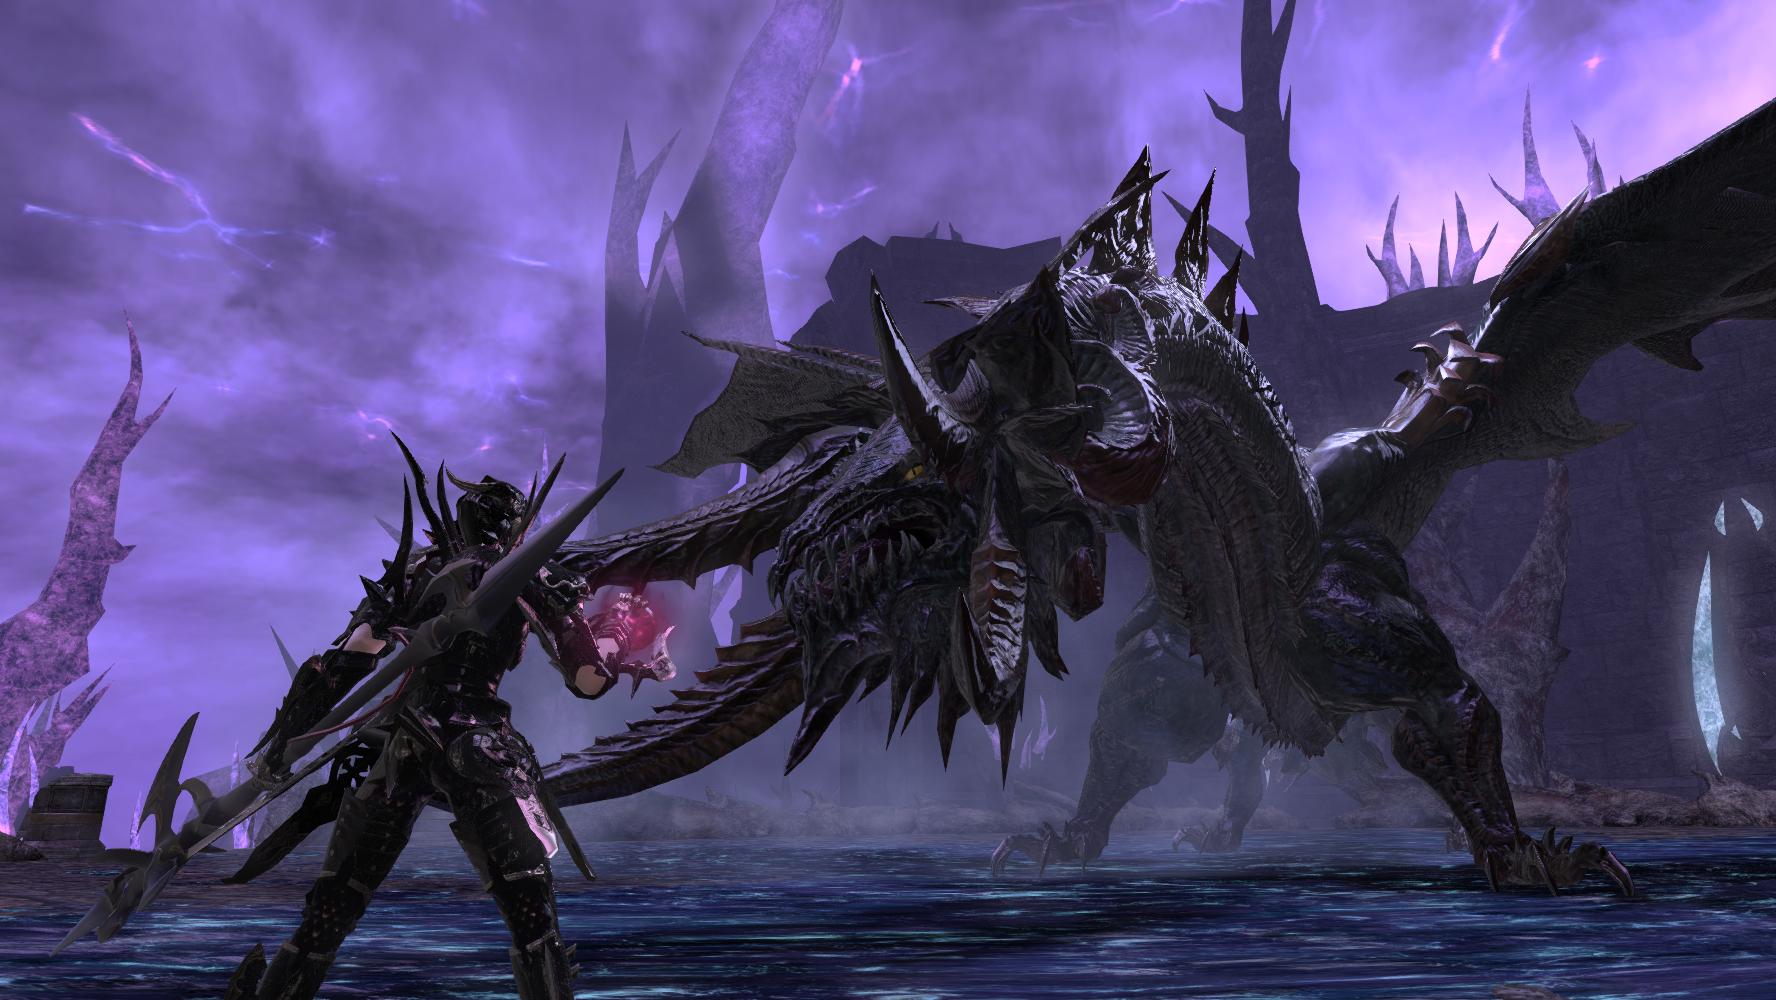 Dragonsong War | Final Fantasy Wiki | FANDOM powered by Wikia